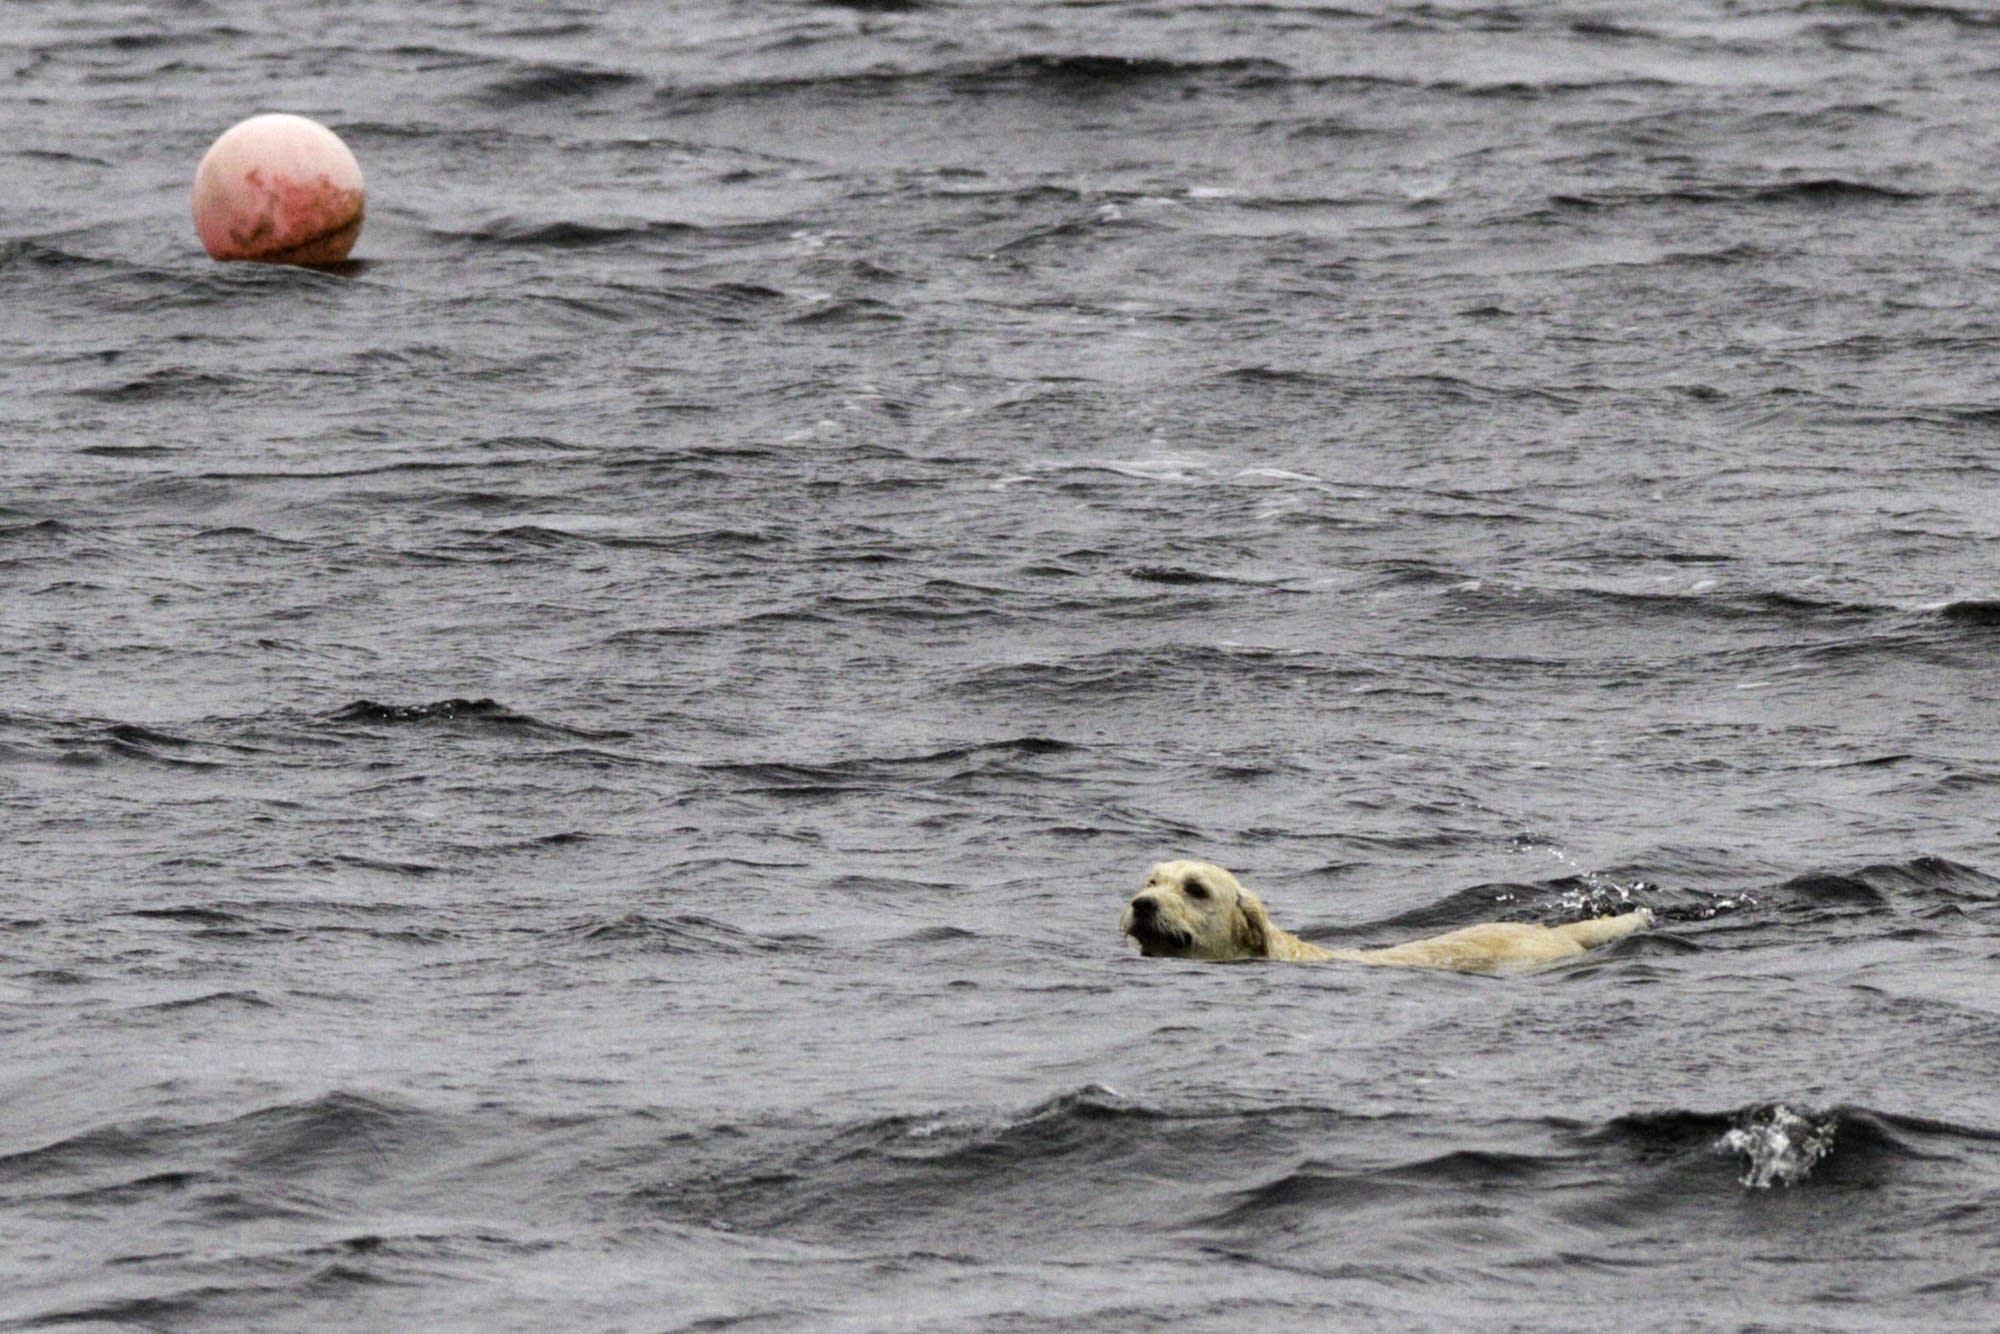 Edinburgh - 20 - Seal